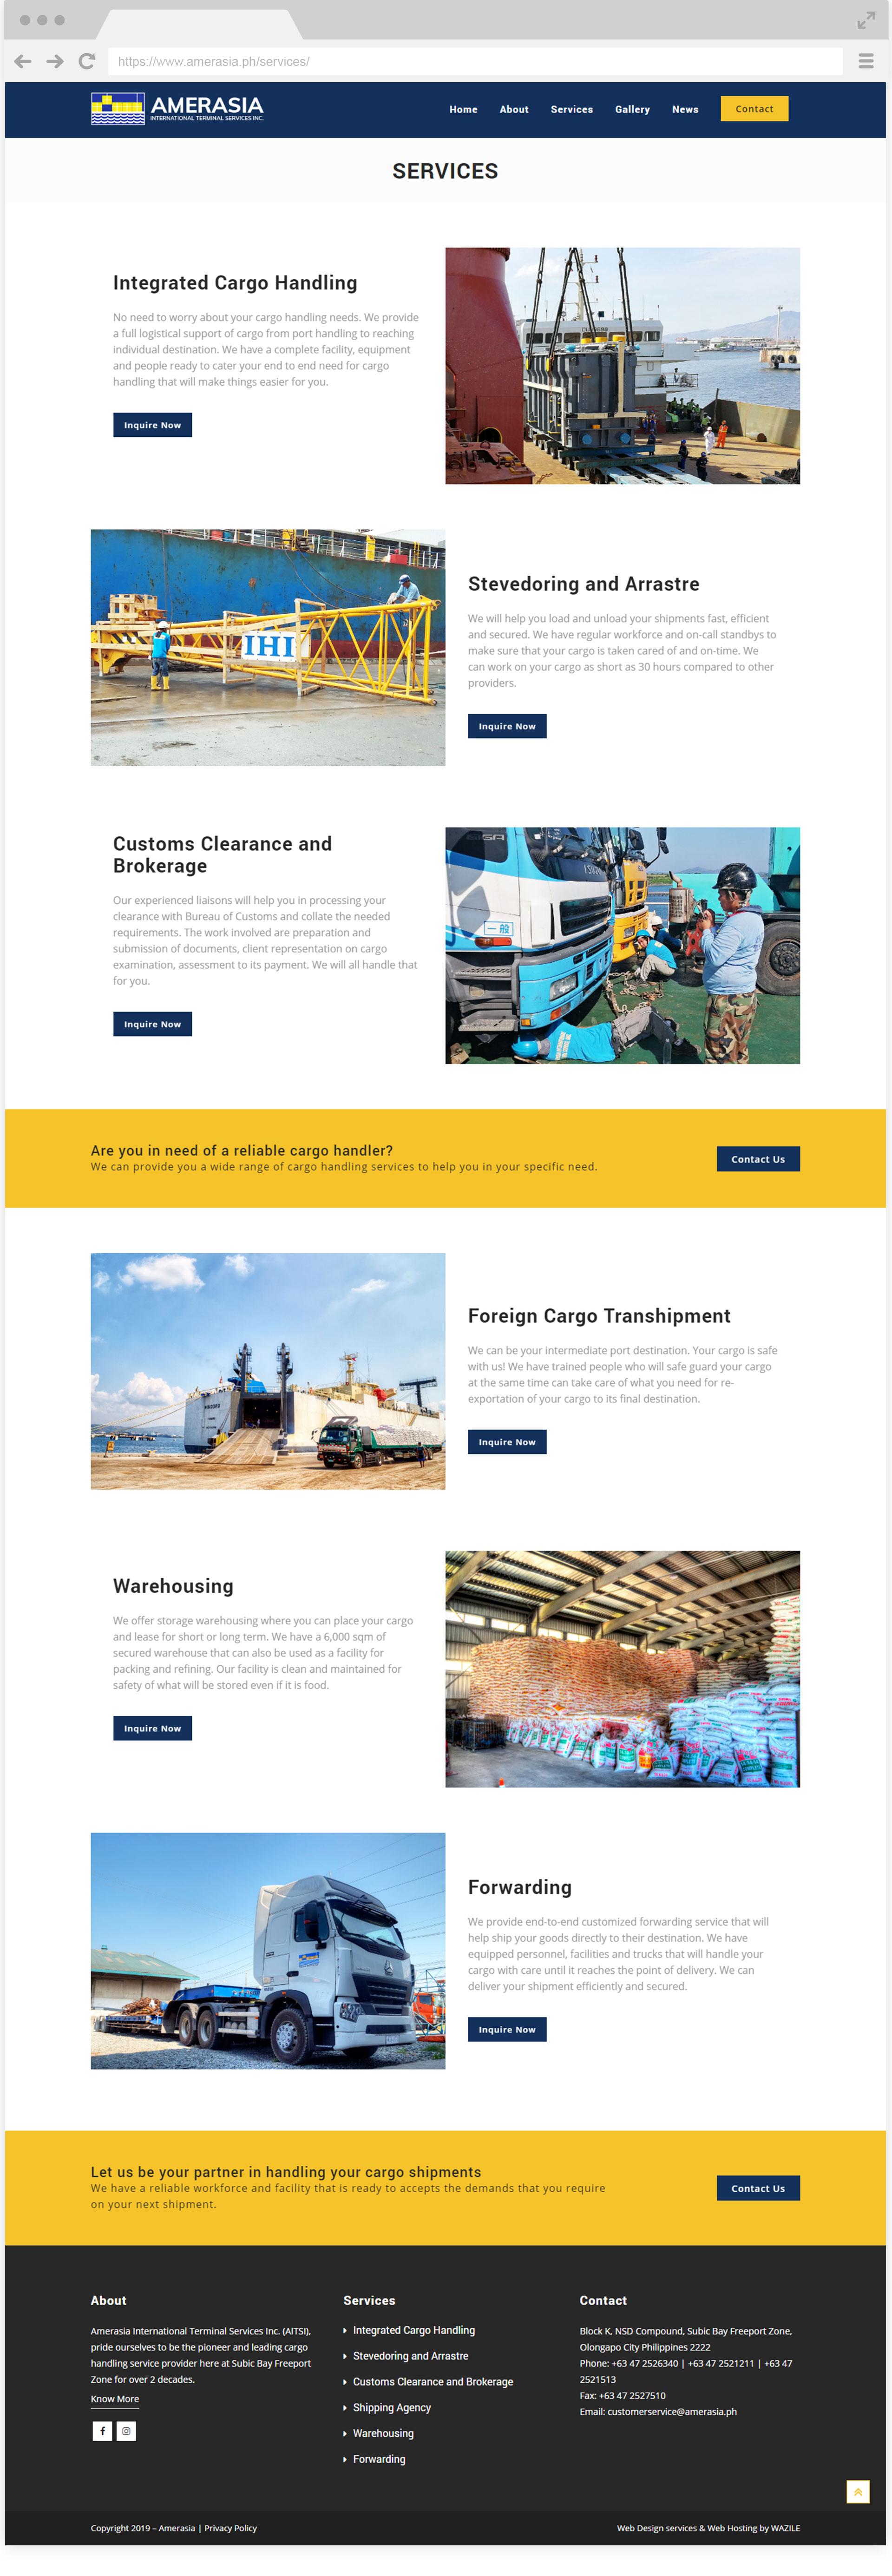 Amerasia Services